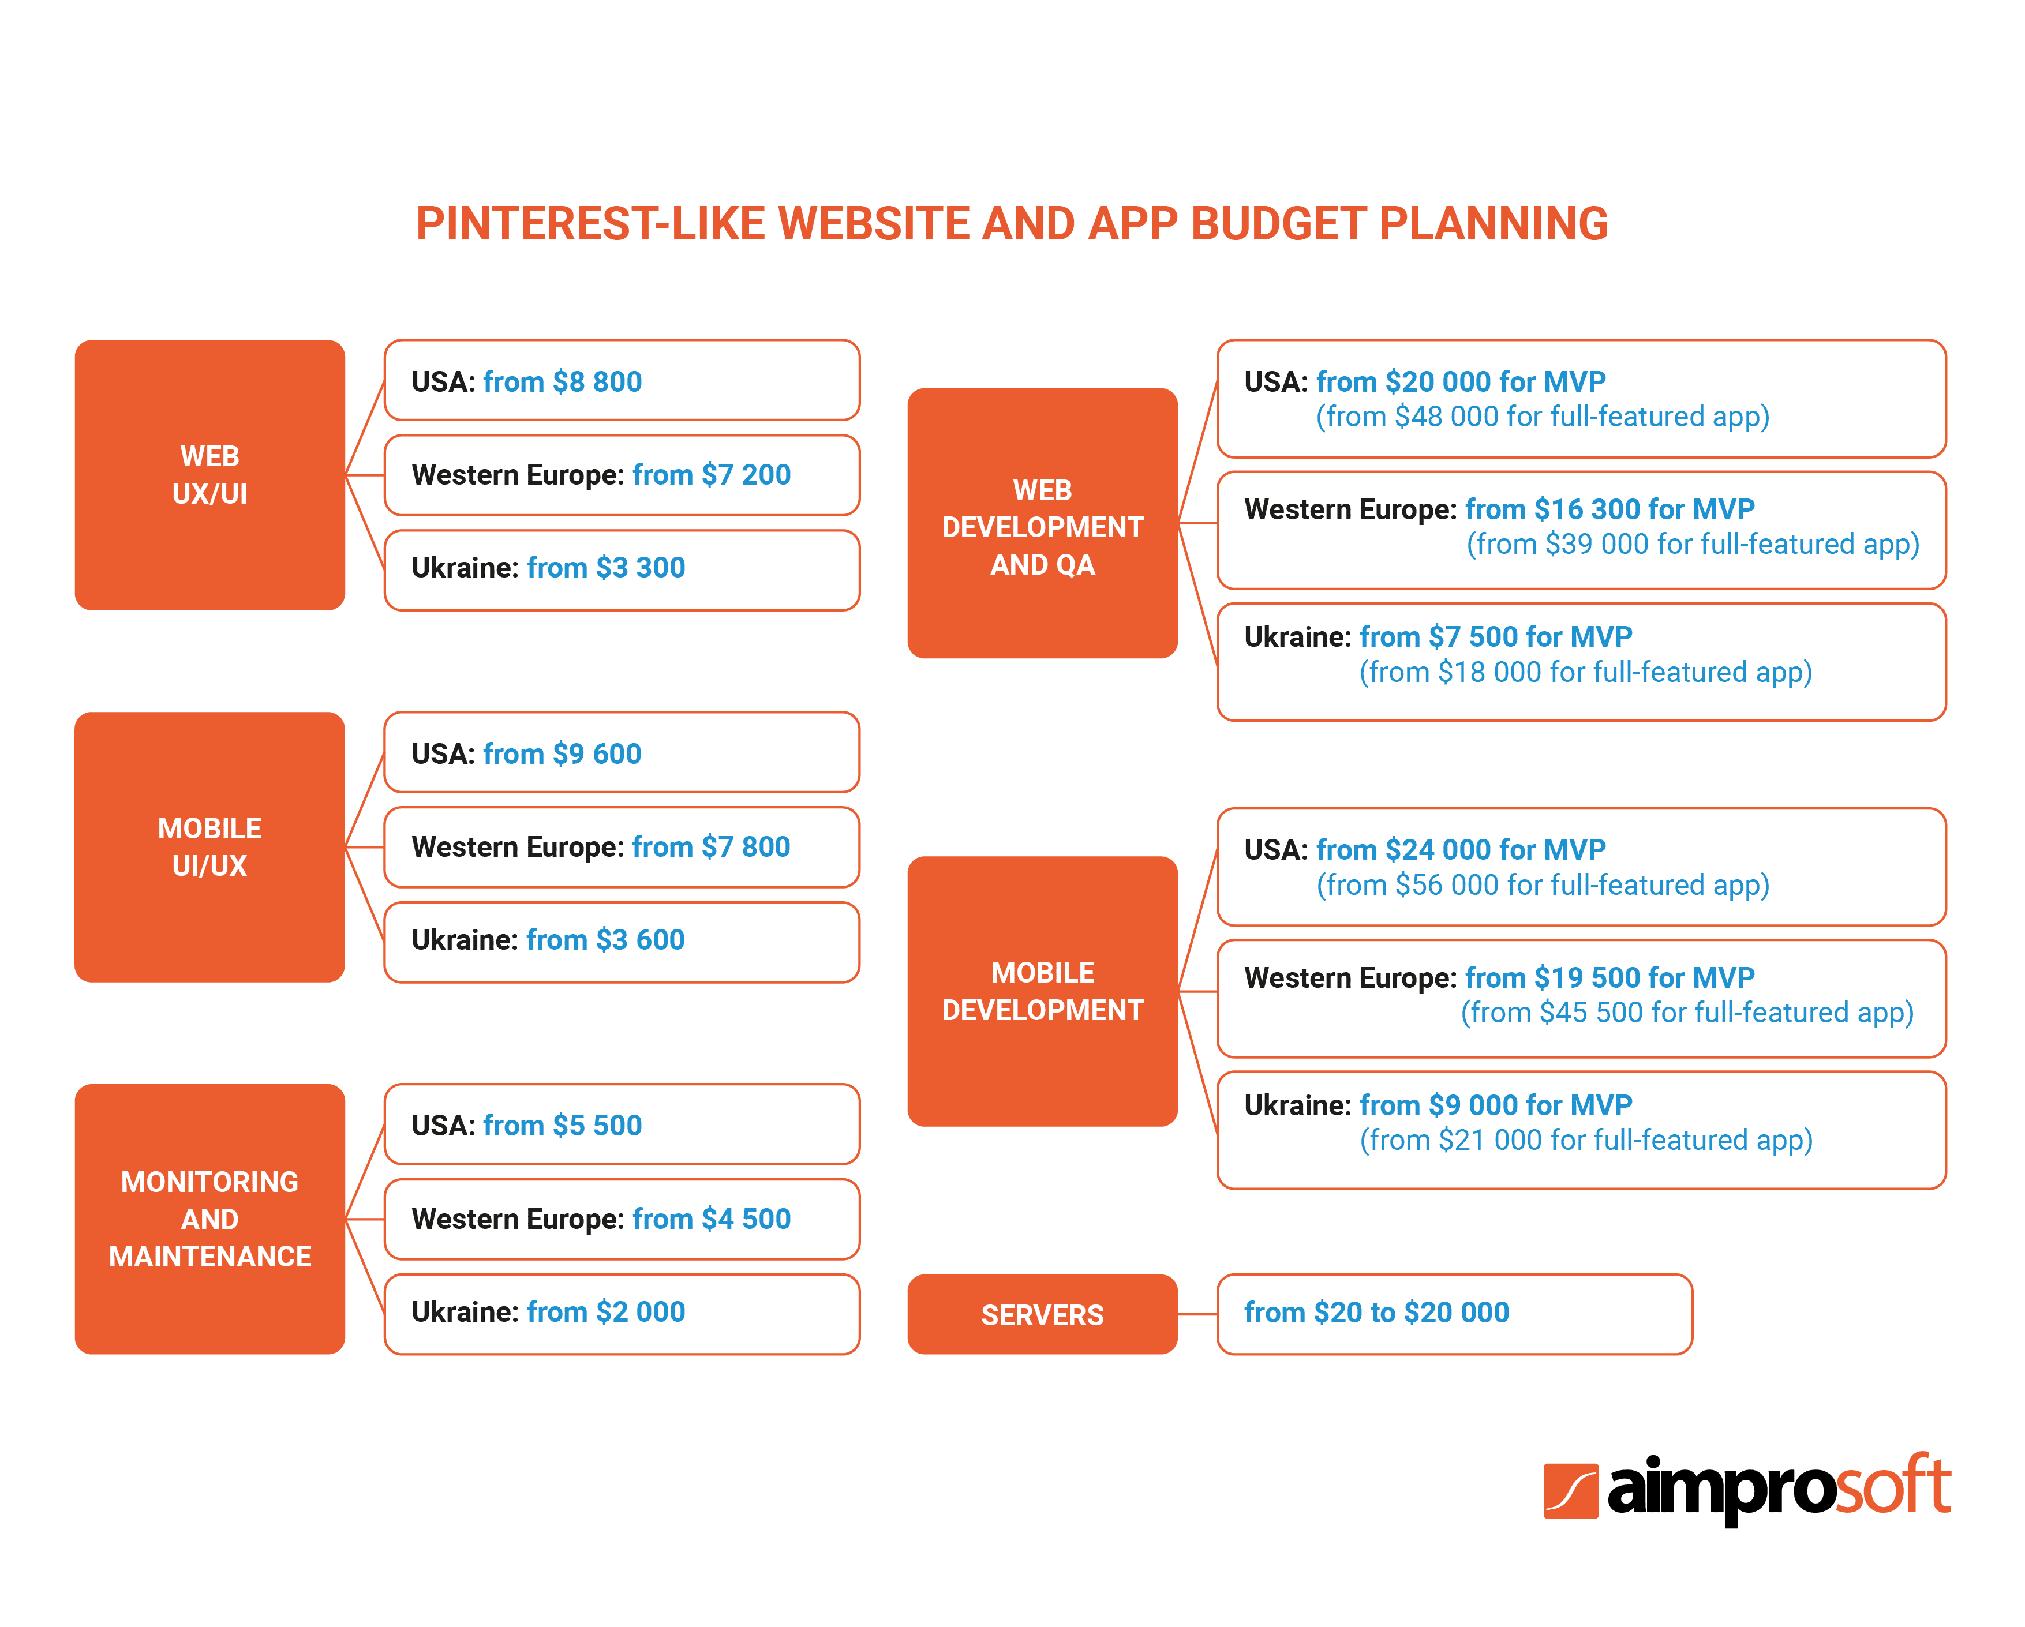 Pinterest-like website and app budget planning